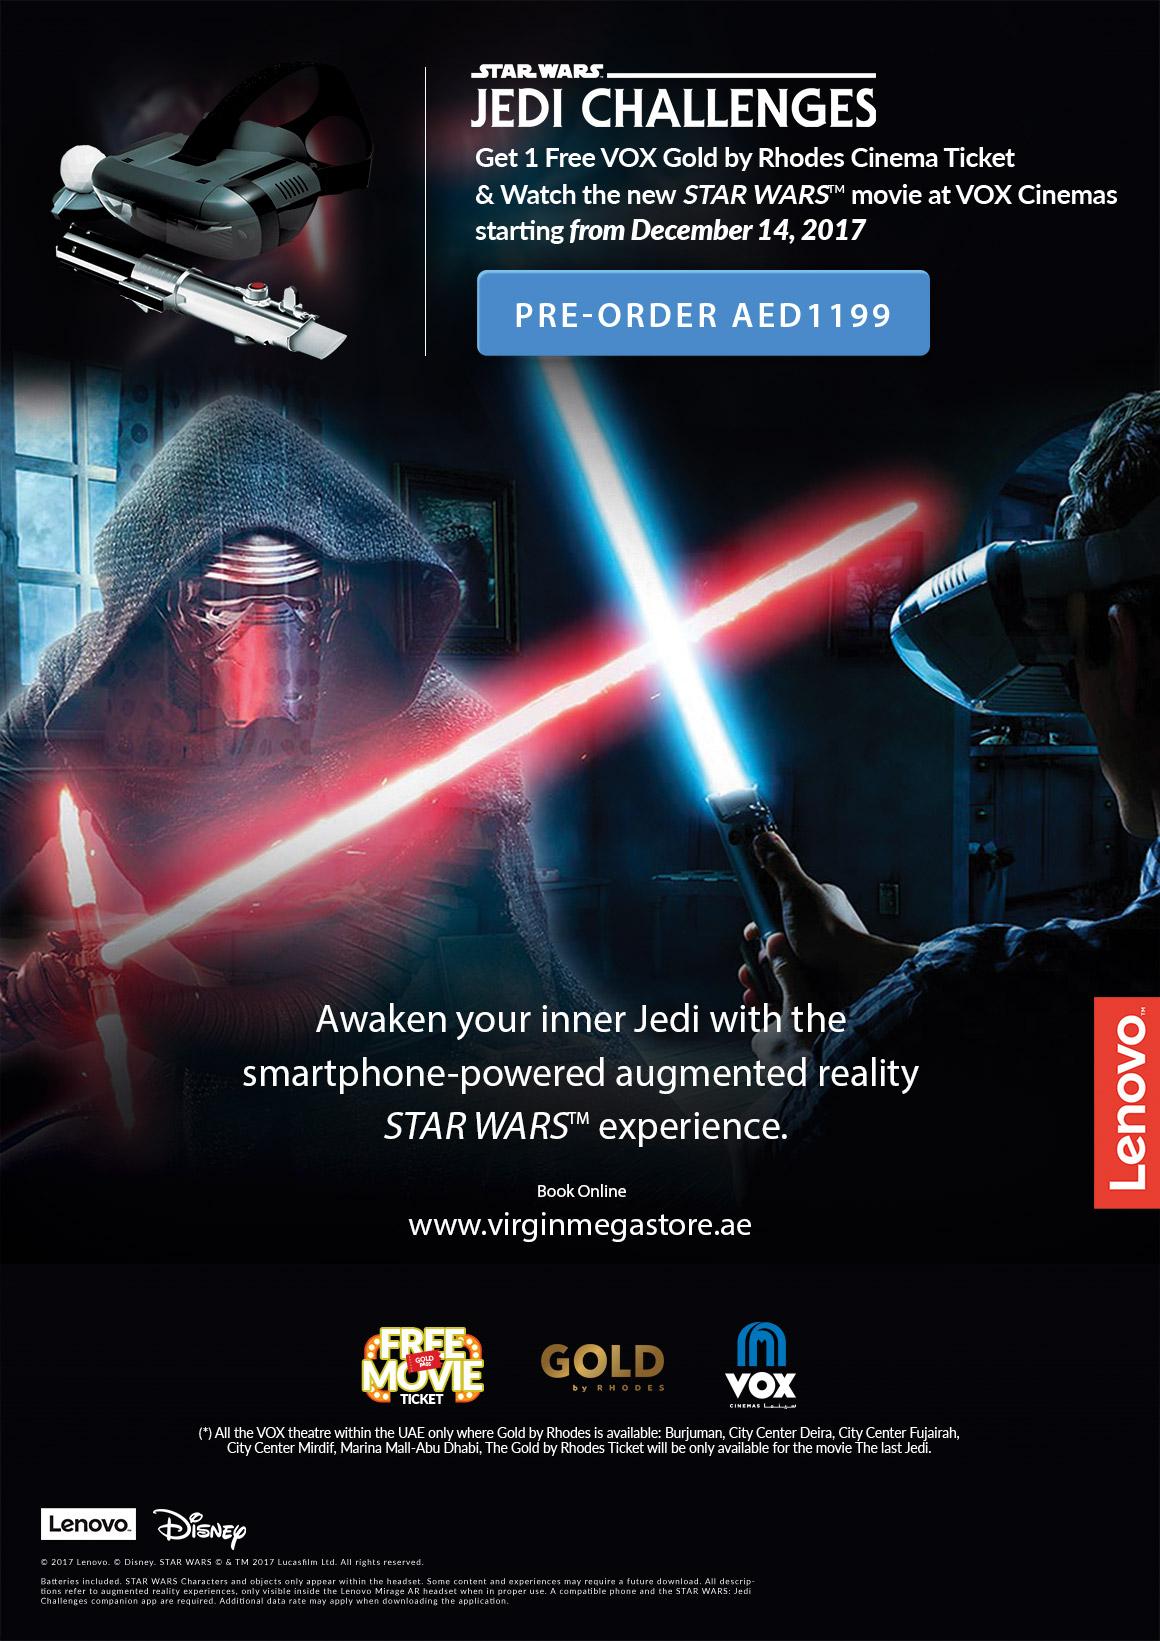 Lenovo Star Wars